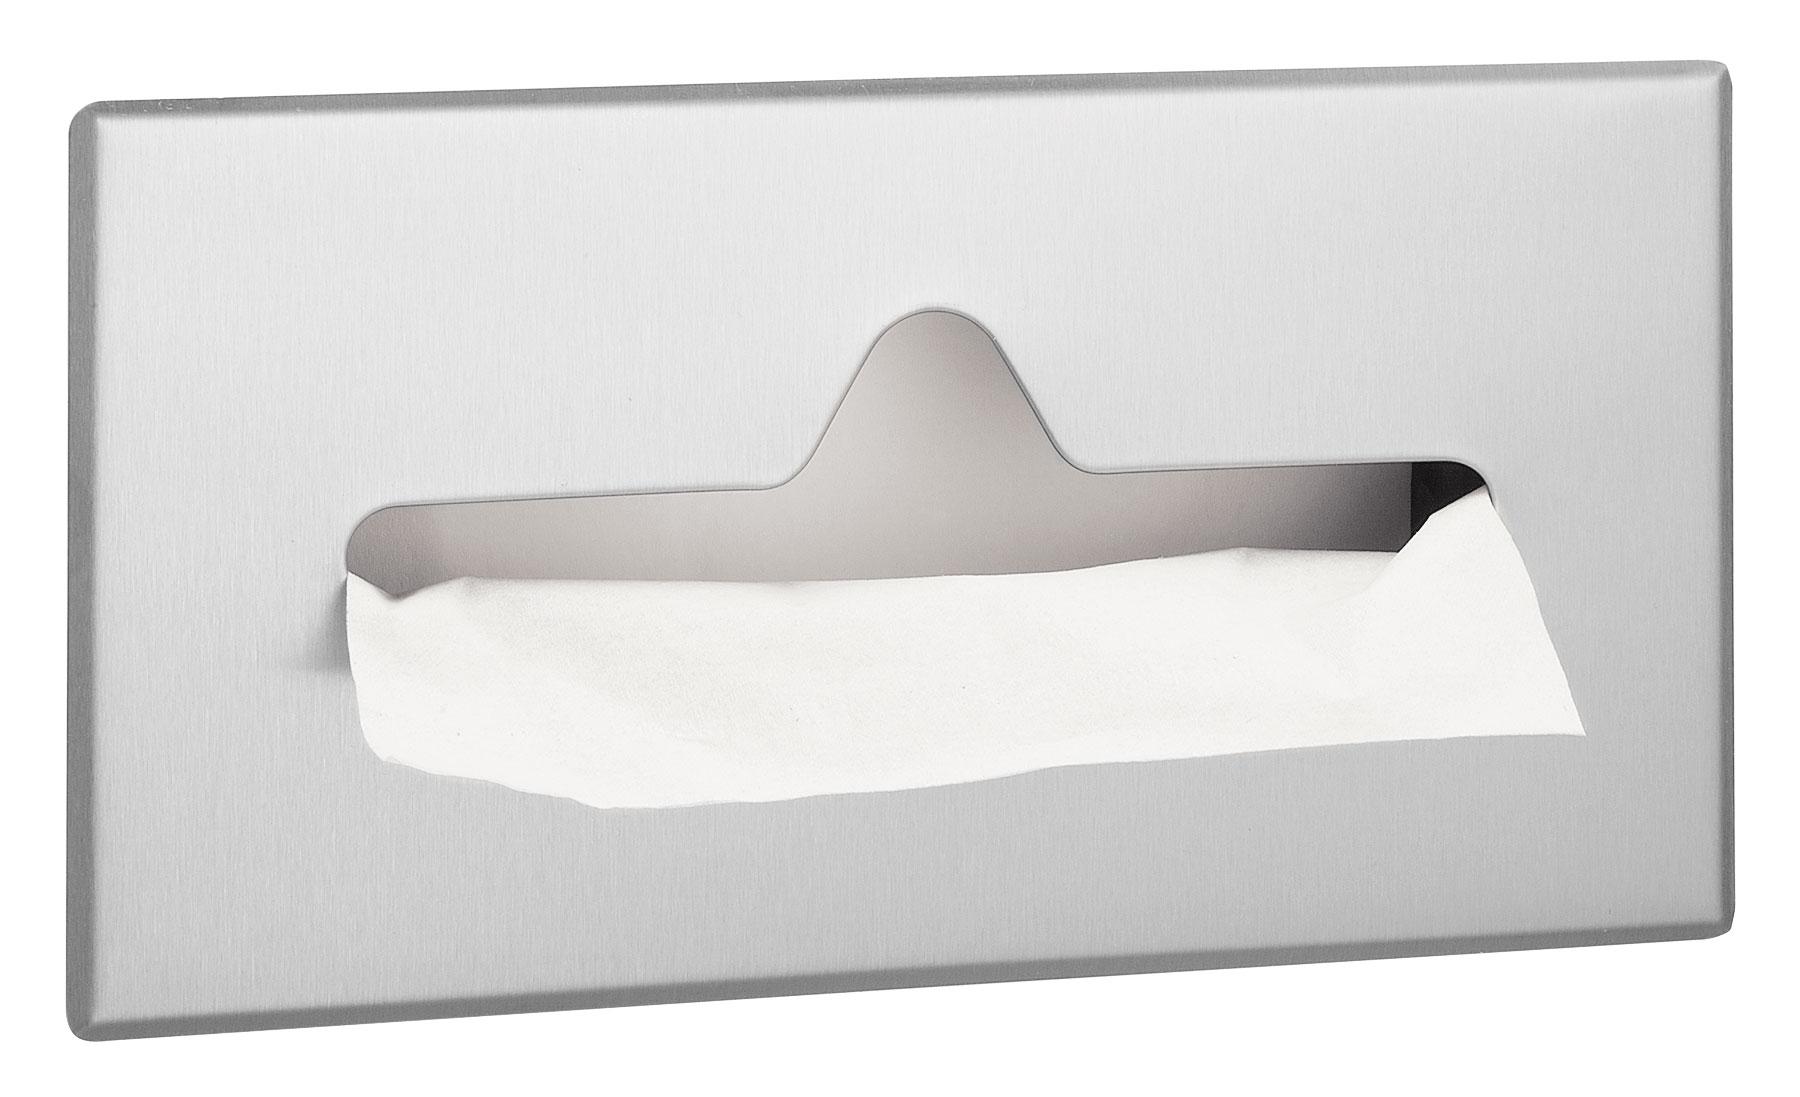 Bradley 987 Recessed Facial Tissue Dispenser - Satin Finish